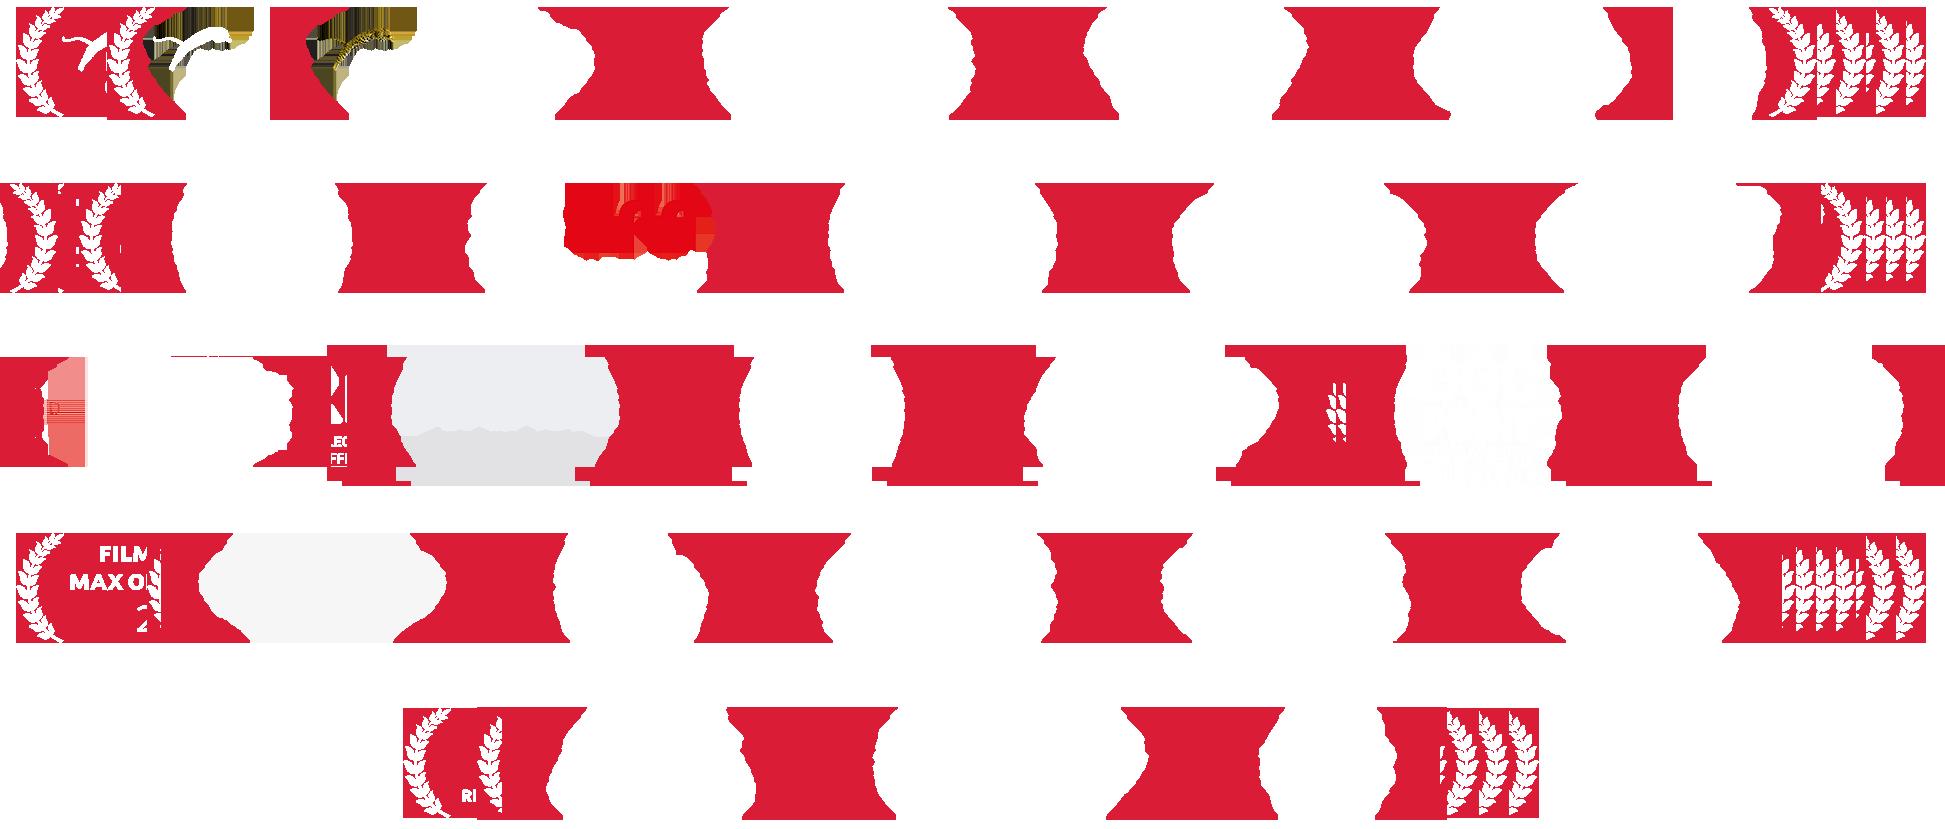 SD-FESTIVALS-1